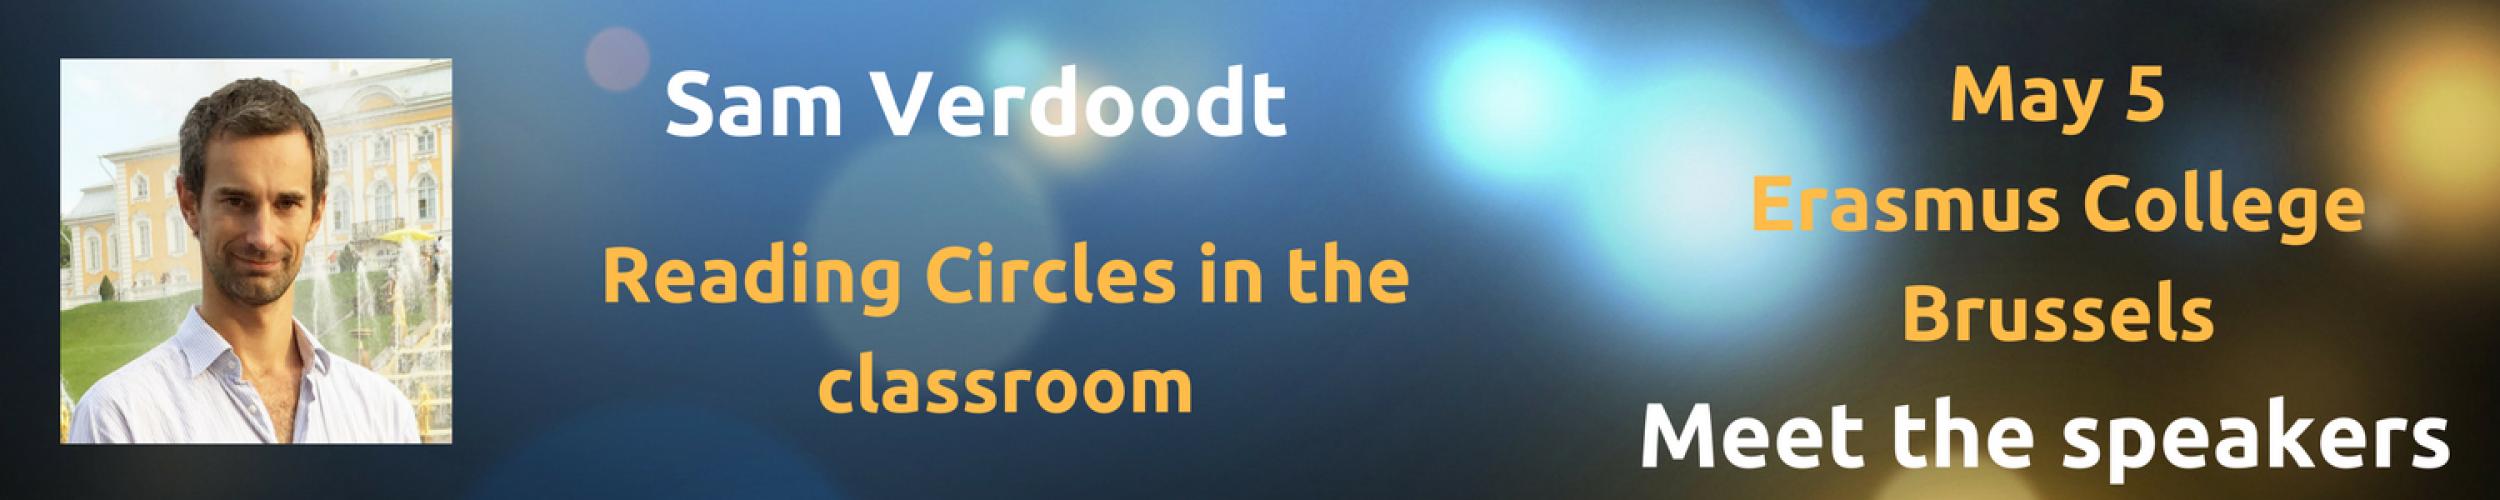 Meet The Speakers: Sam Verdoodt